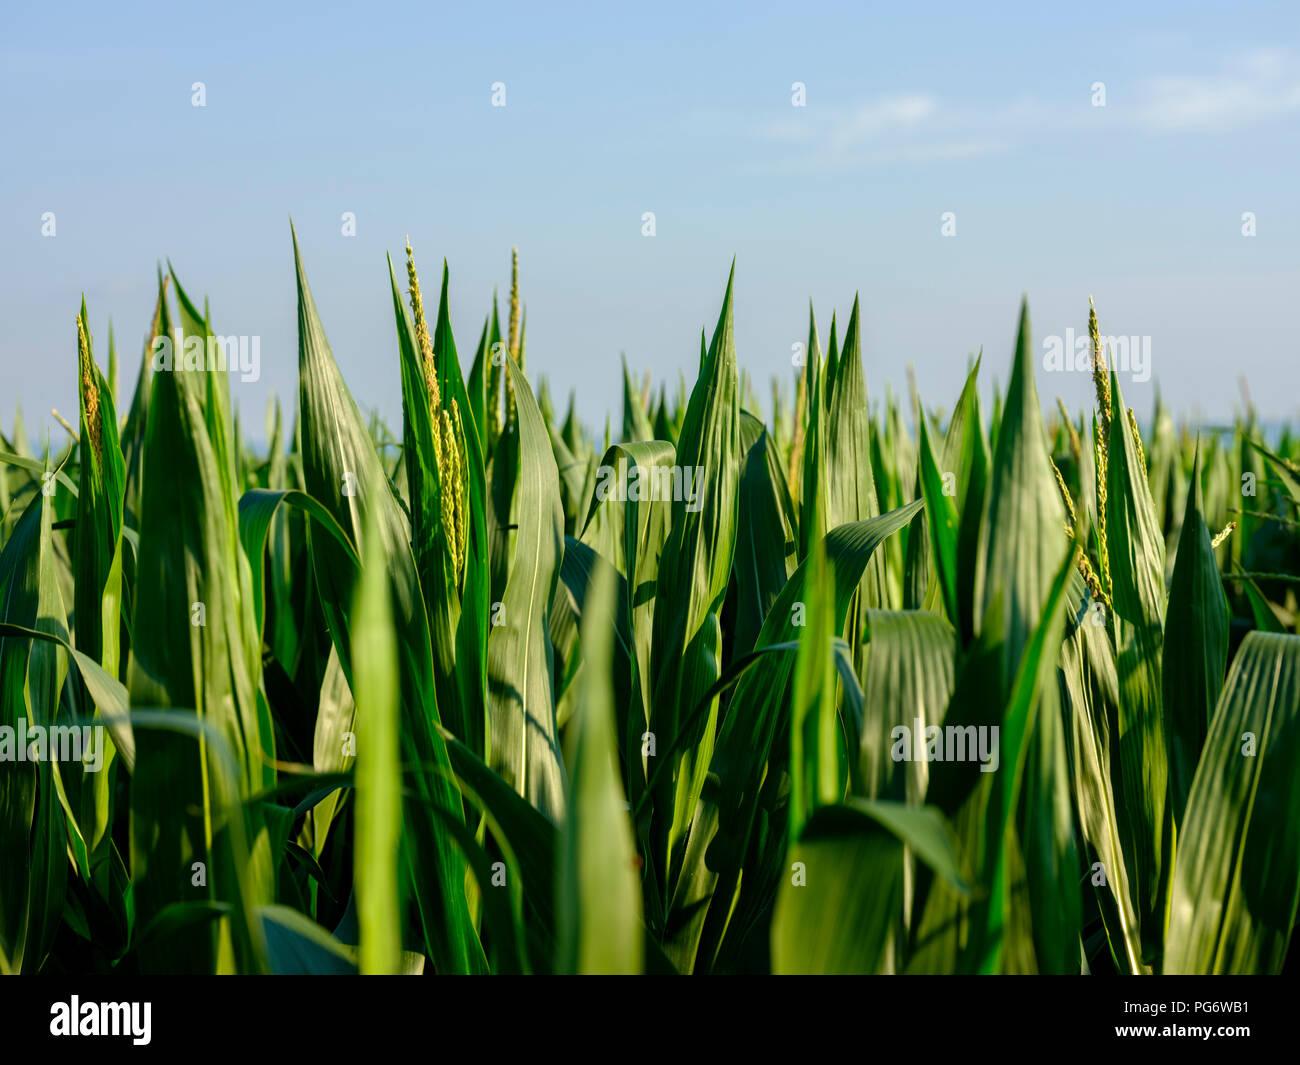 Serbia, Vojvodina. Green corn male flowers, zea mays - Stock Image